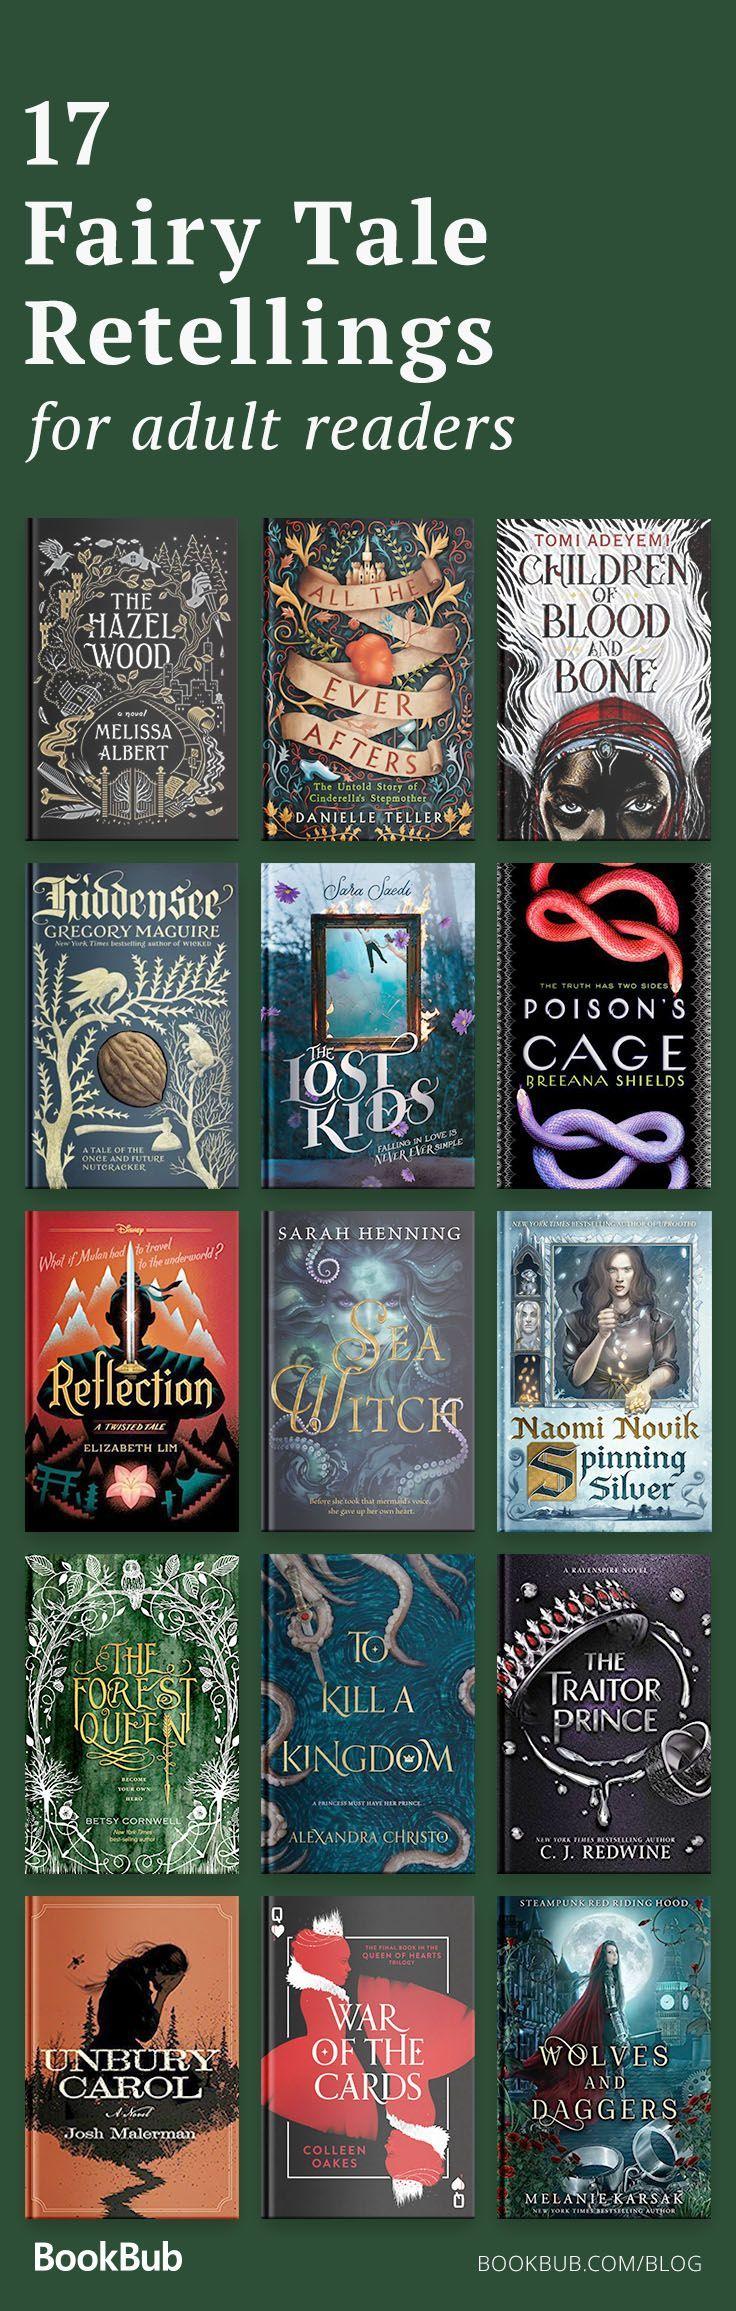 17 Fairy Tale Retellings for Adult Readers